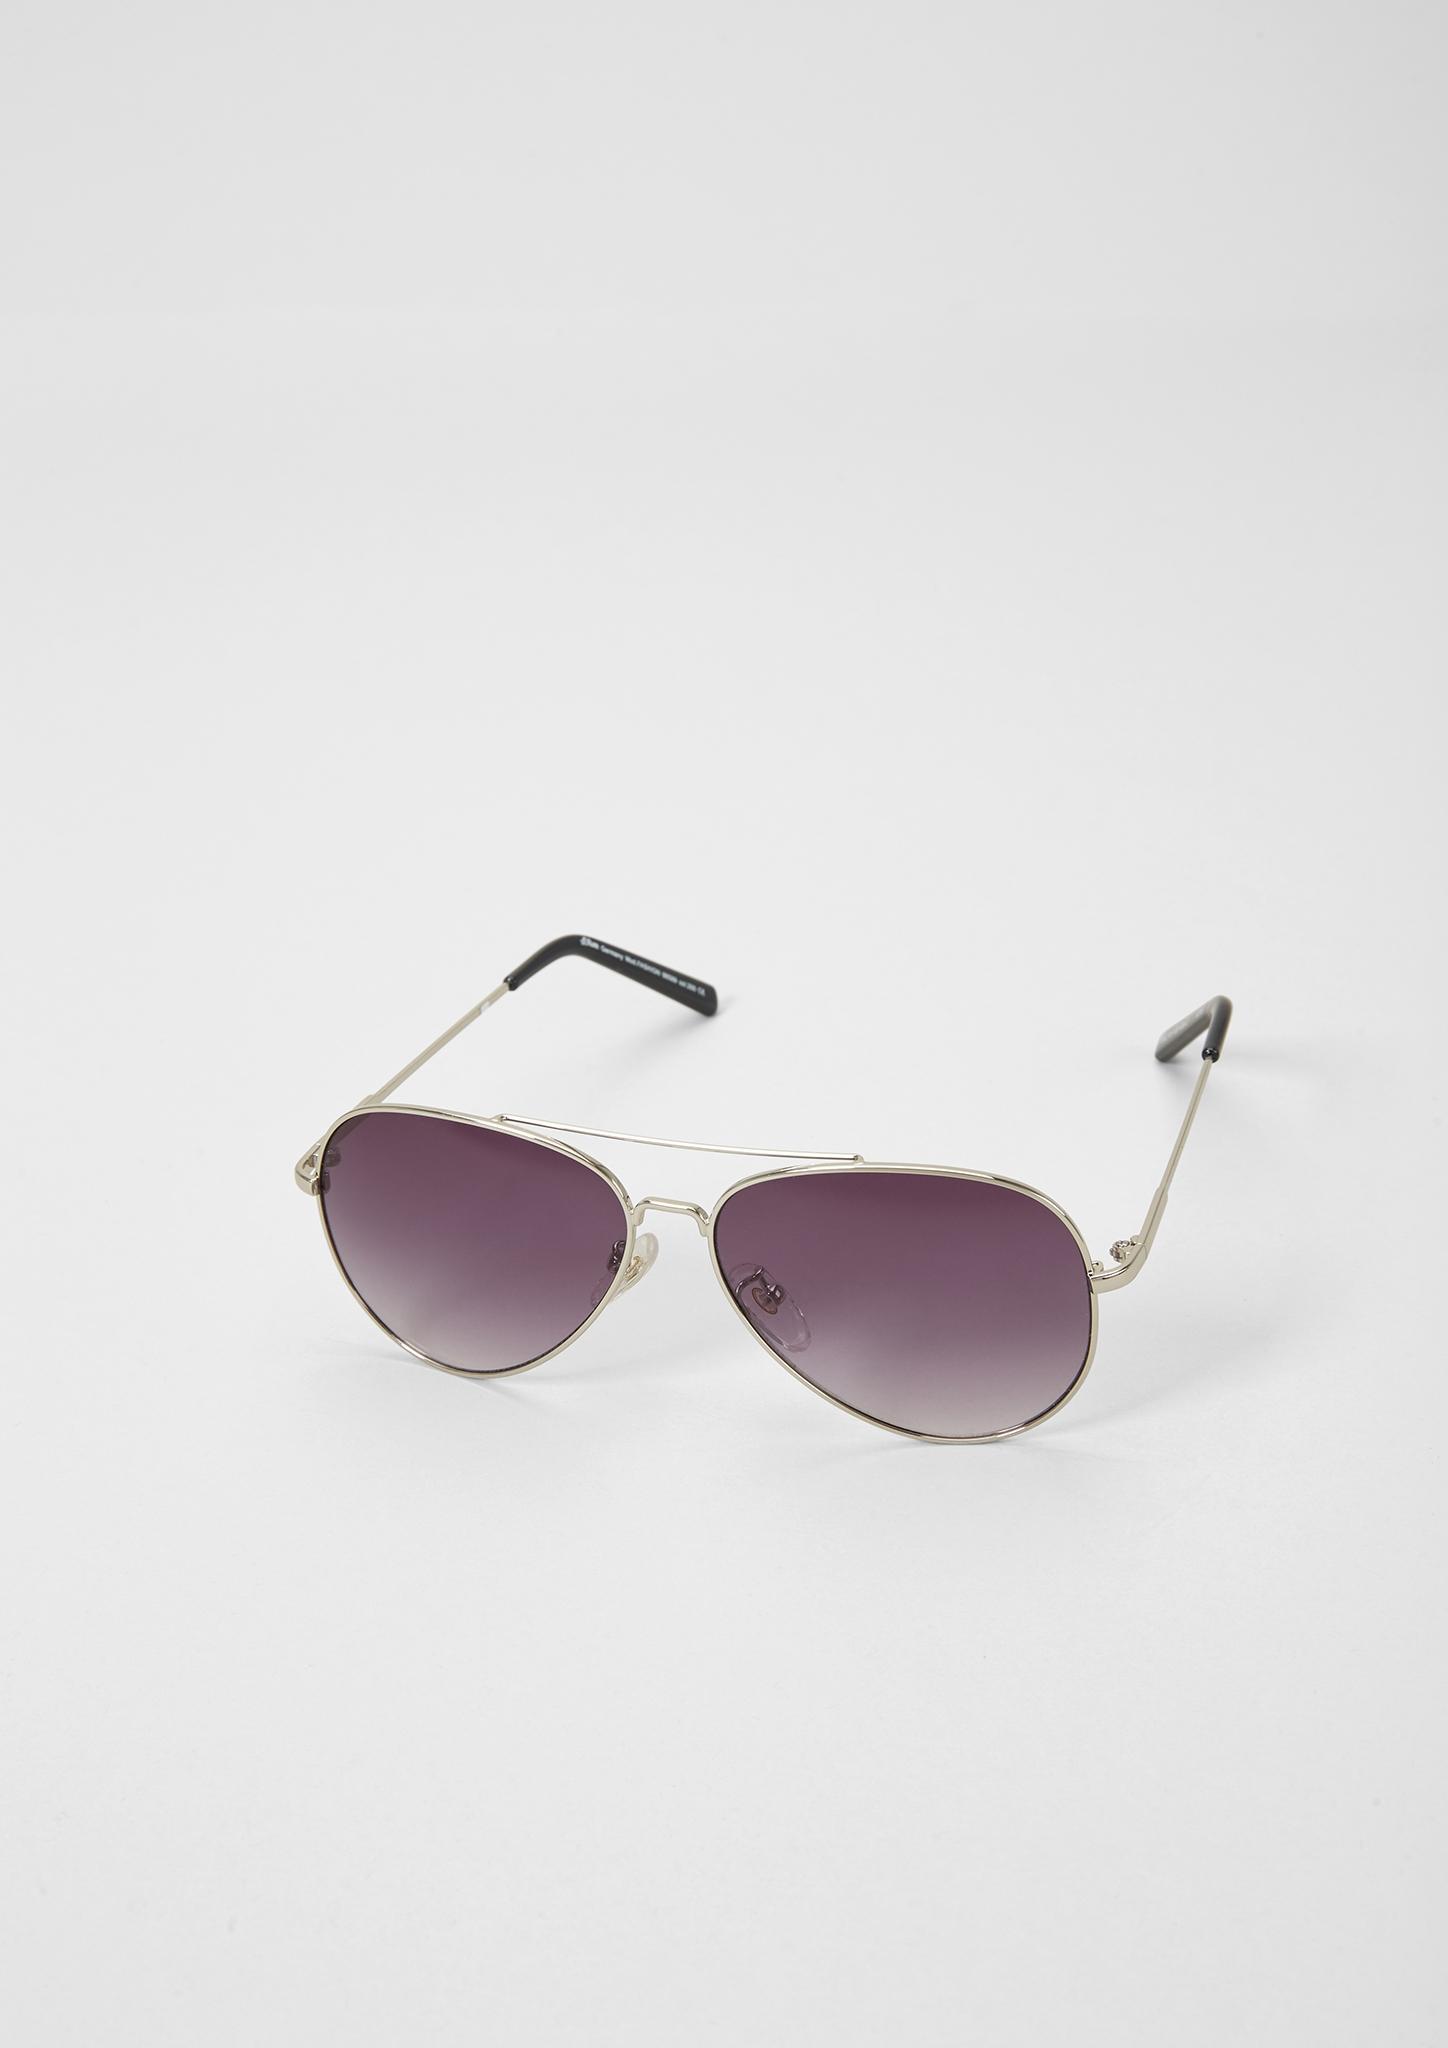 Piloten-Sonnenbrille | Accessoires > Sonnenbrillen > Pilotenbrille | s.Oliver